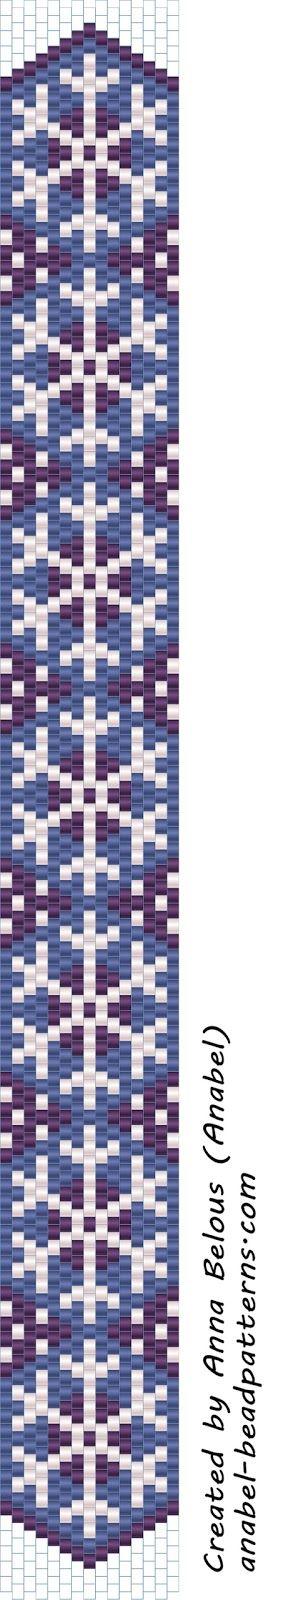 Схема узкого браслета со снежинками / Snowflake peyote pattern